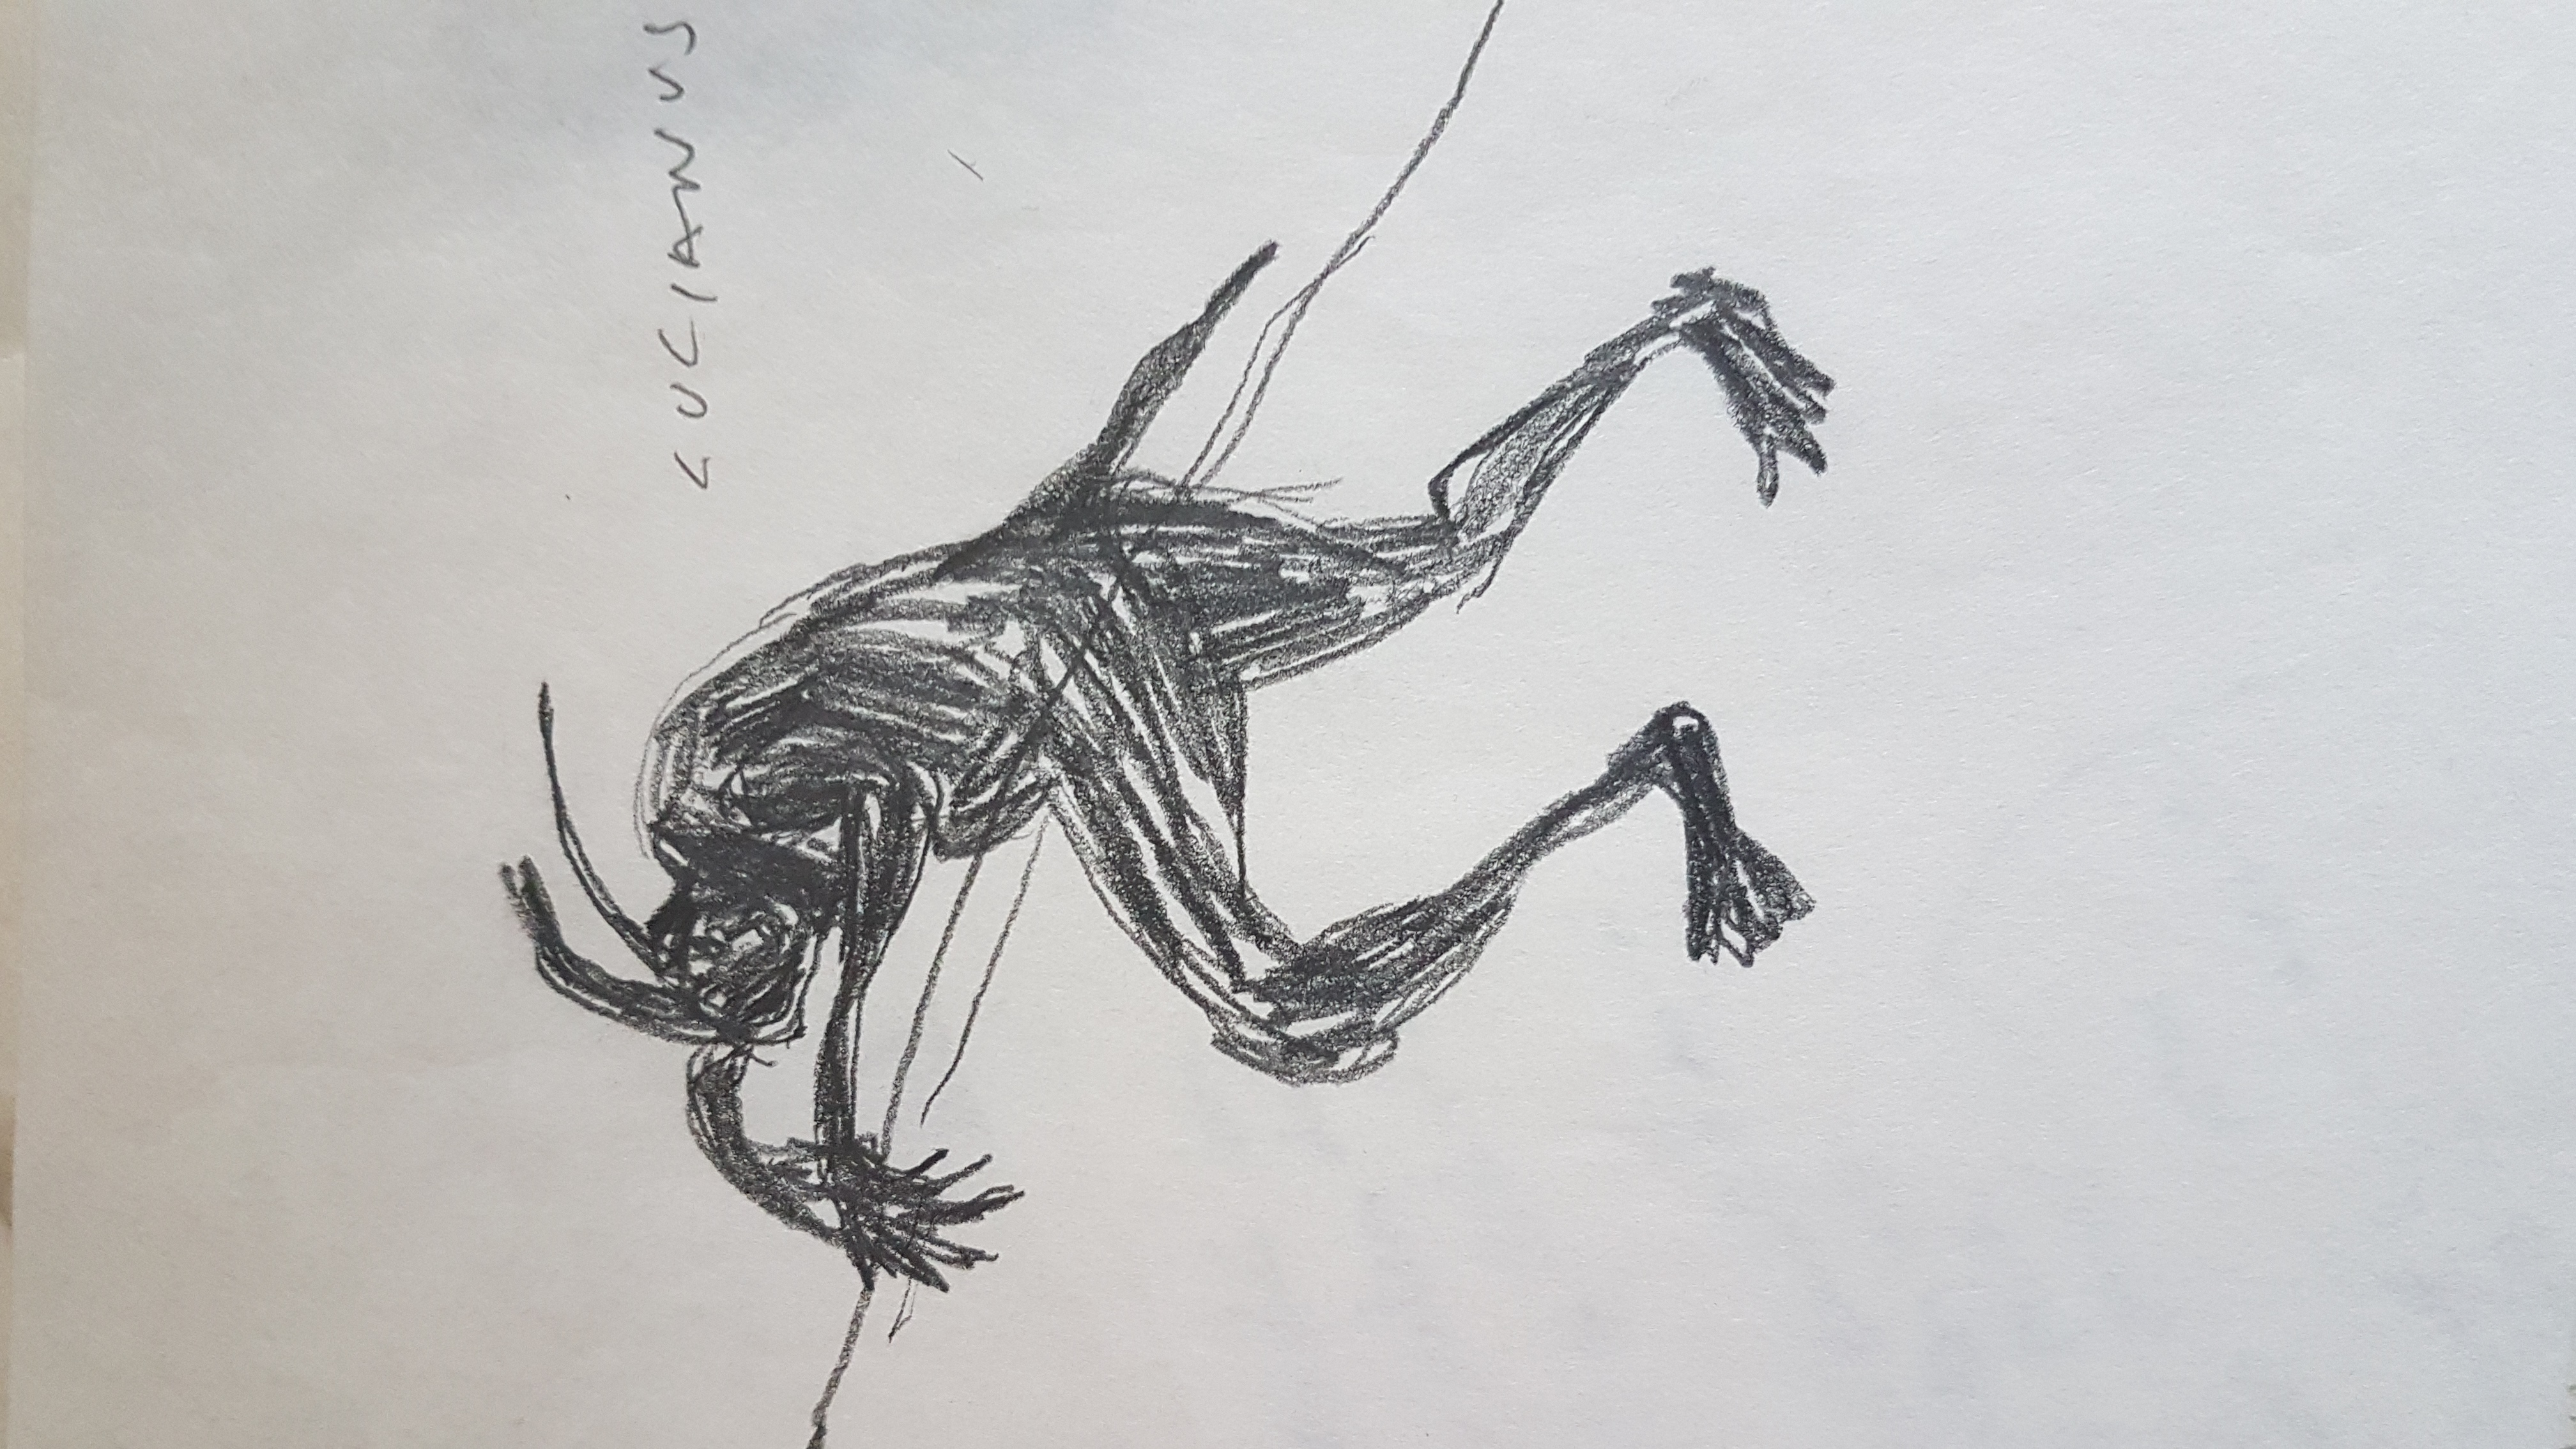 20201102_121009(1)